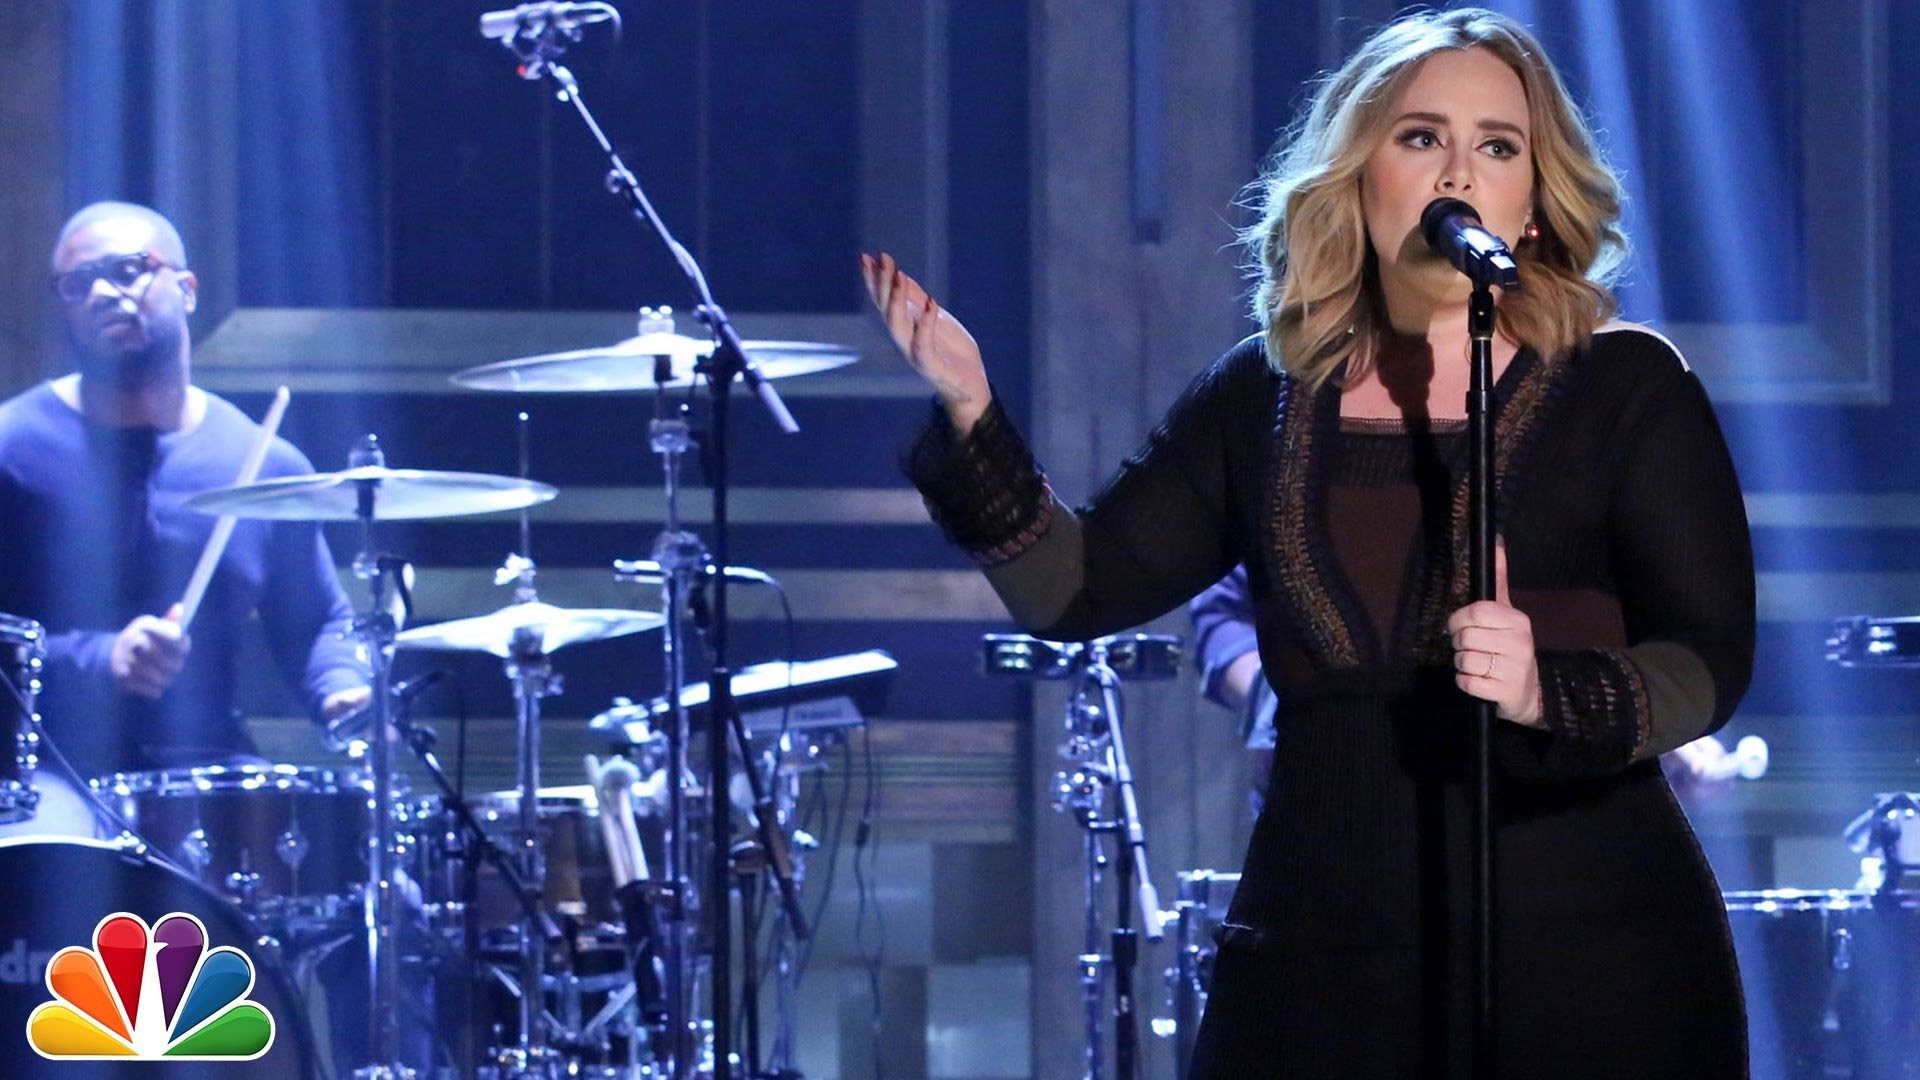 Adele : The Tonight Show (Nov. 2015) photo adele-water-under-the-bridge-lis.jpg